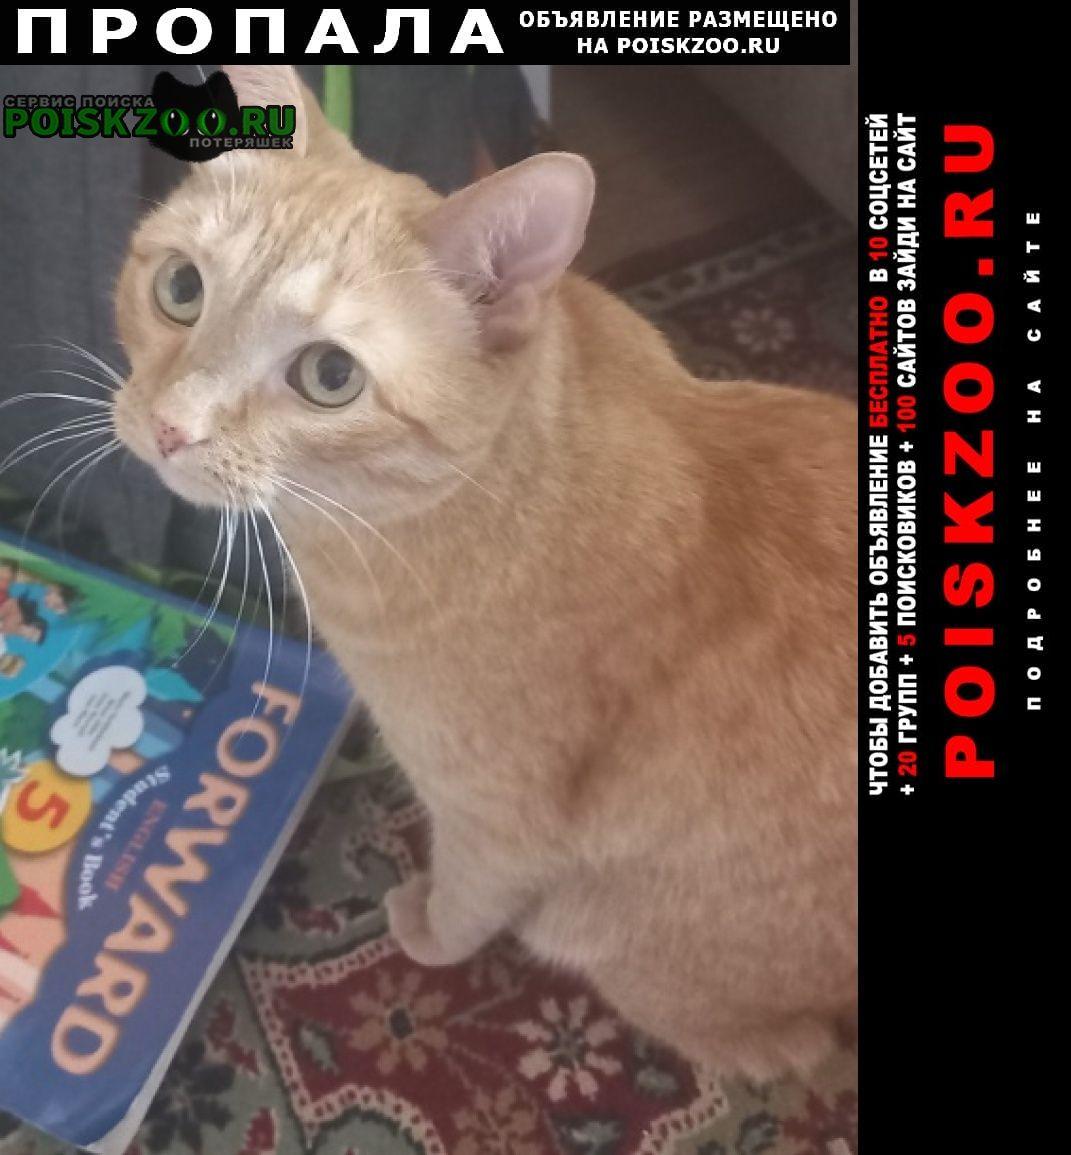 Пропала кошка г. Рязань